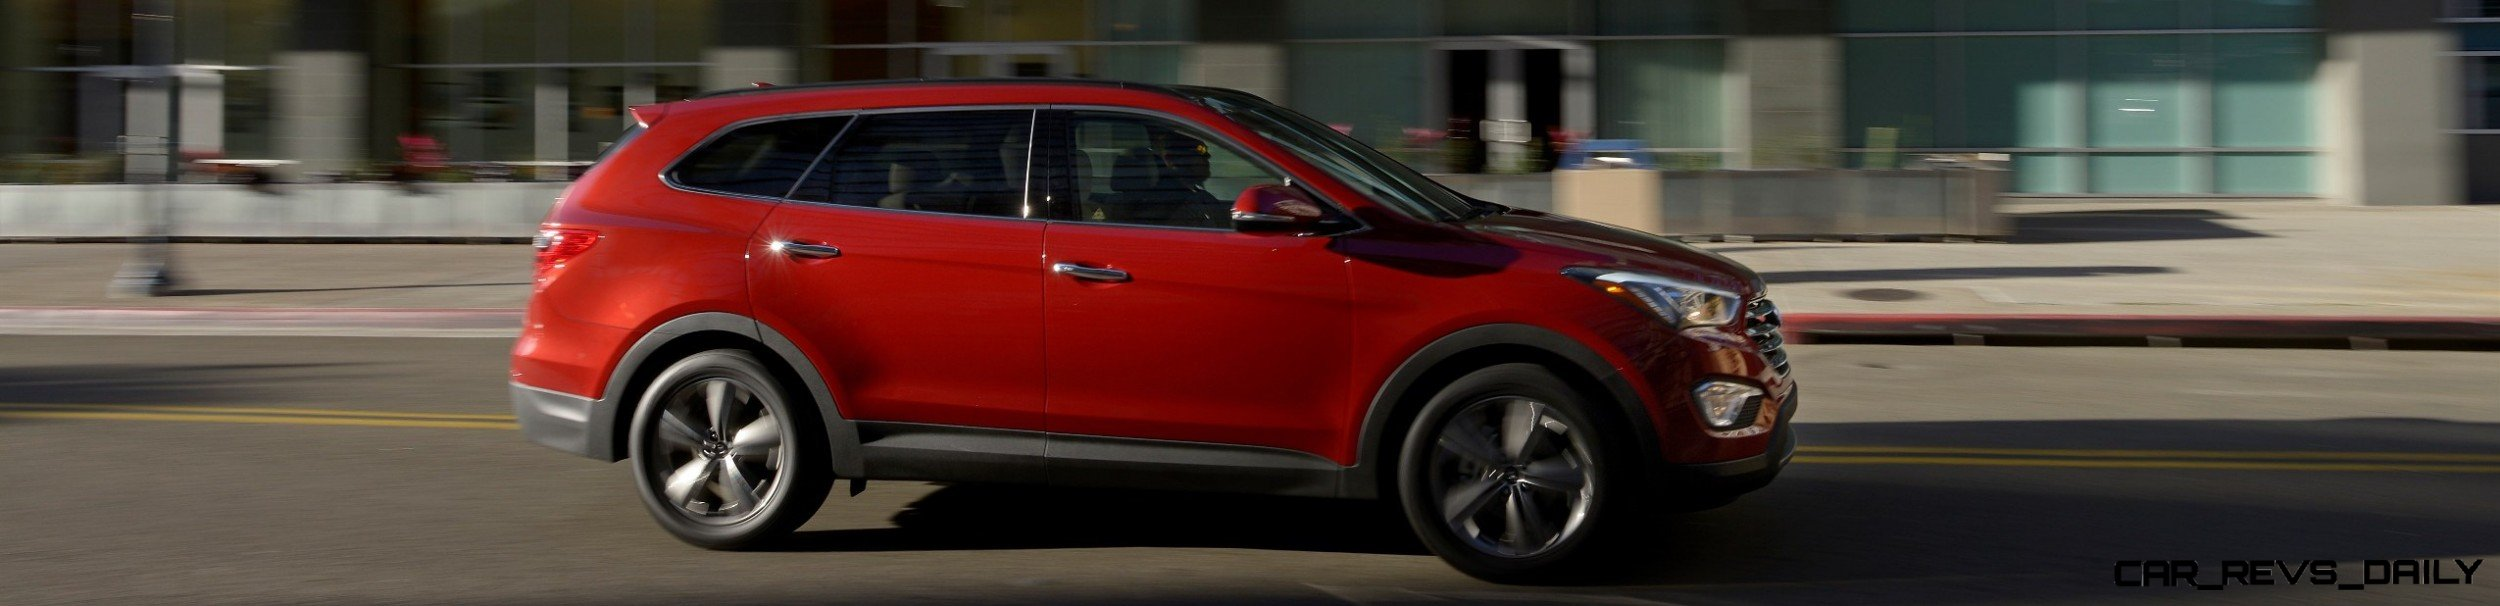 2014 Hyundai Sante Fe Sport Vs Lwb Buyers Guide With